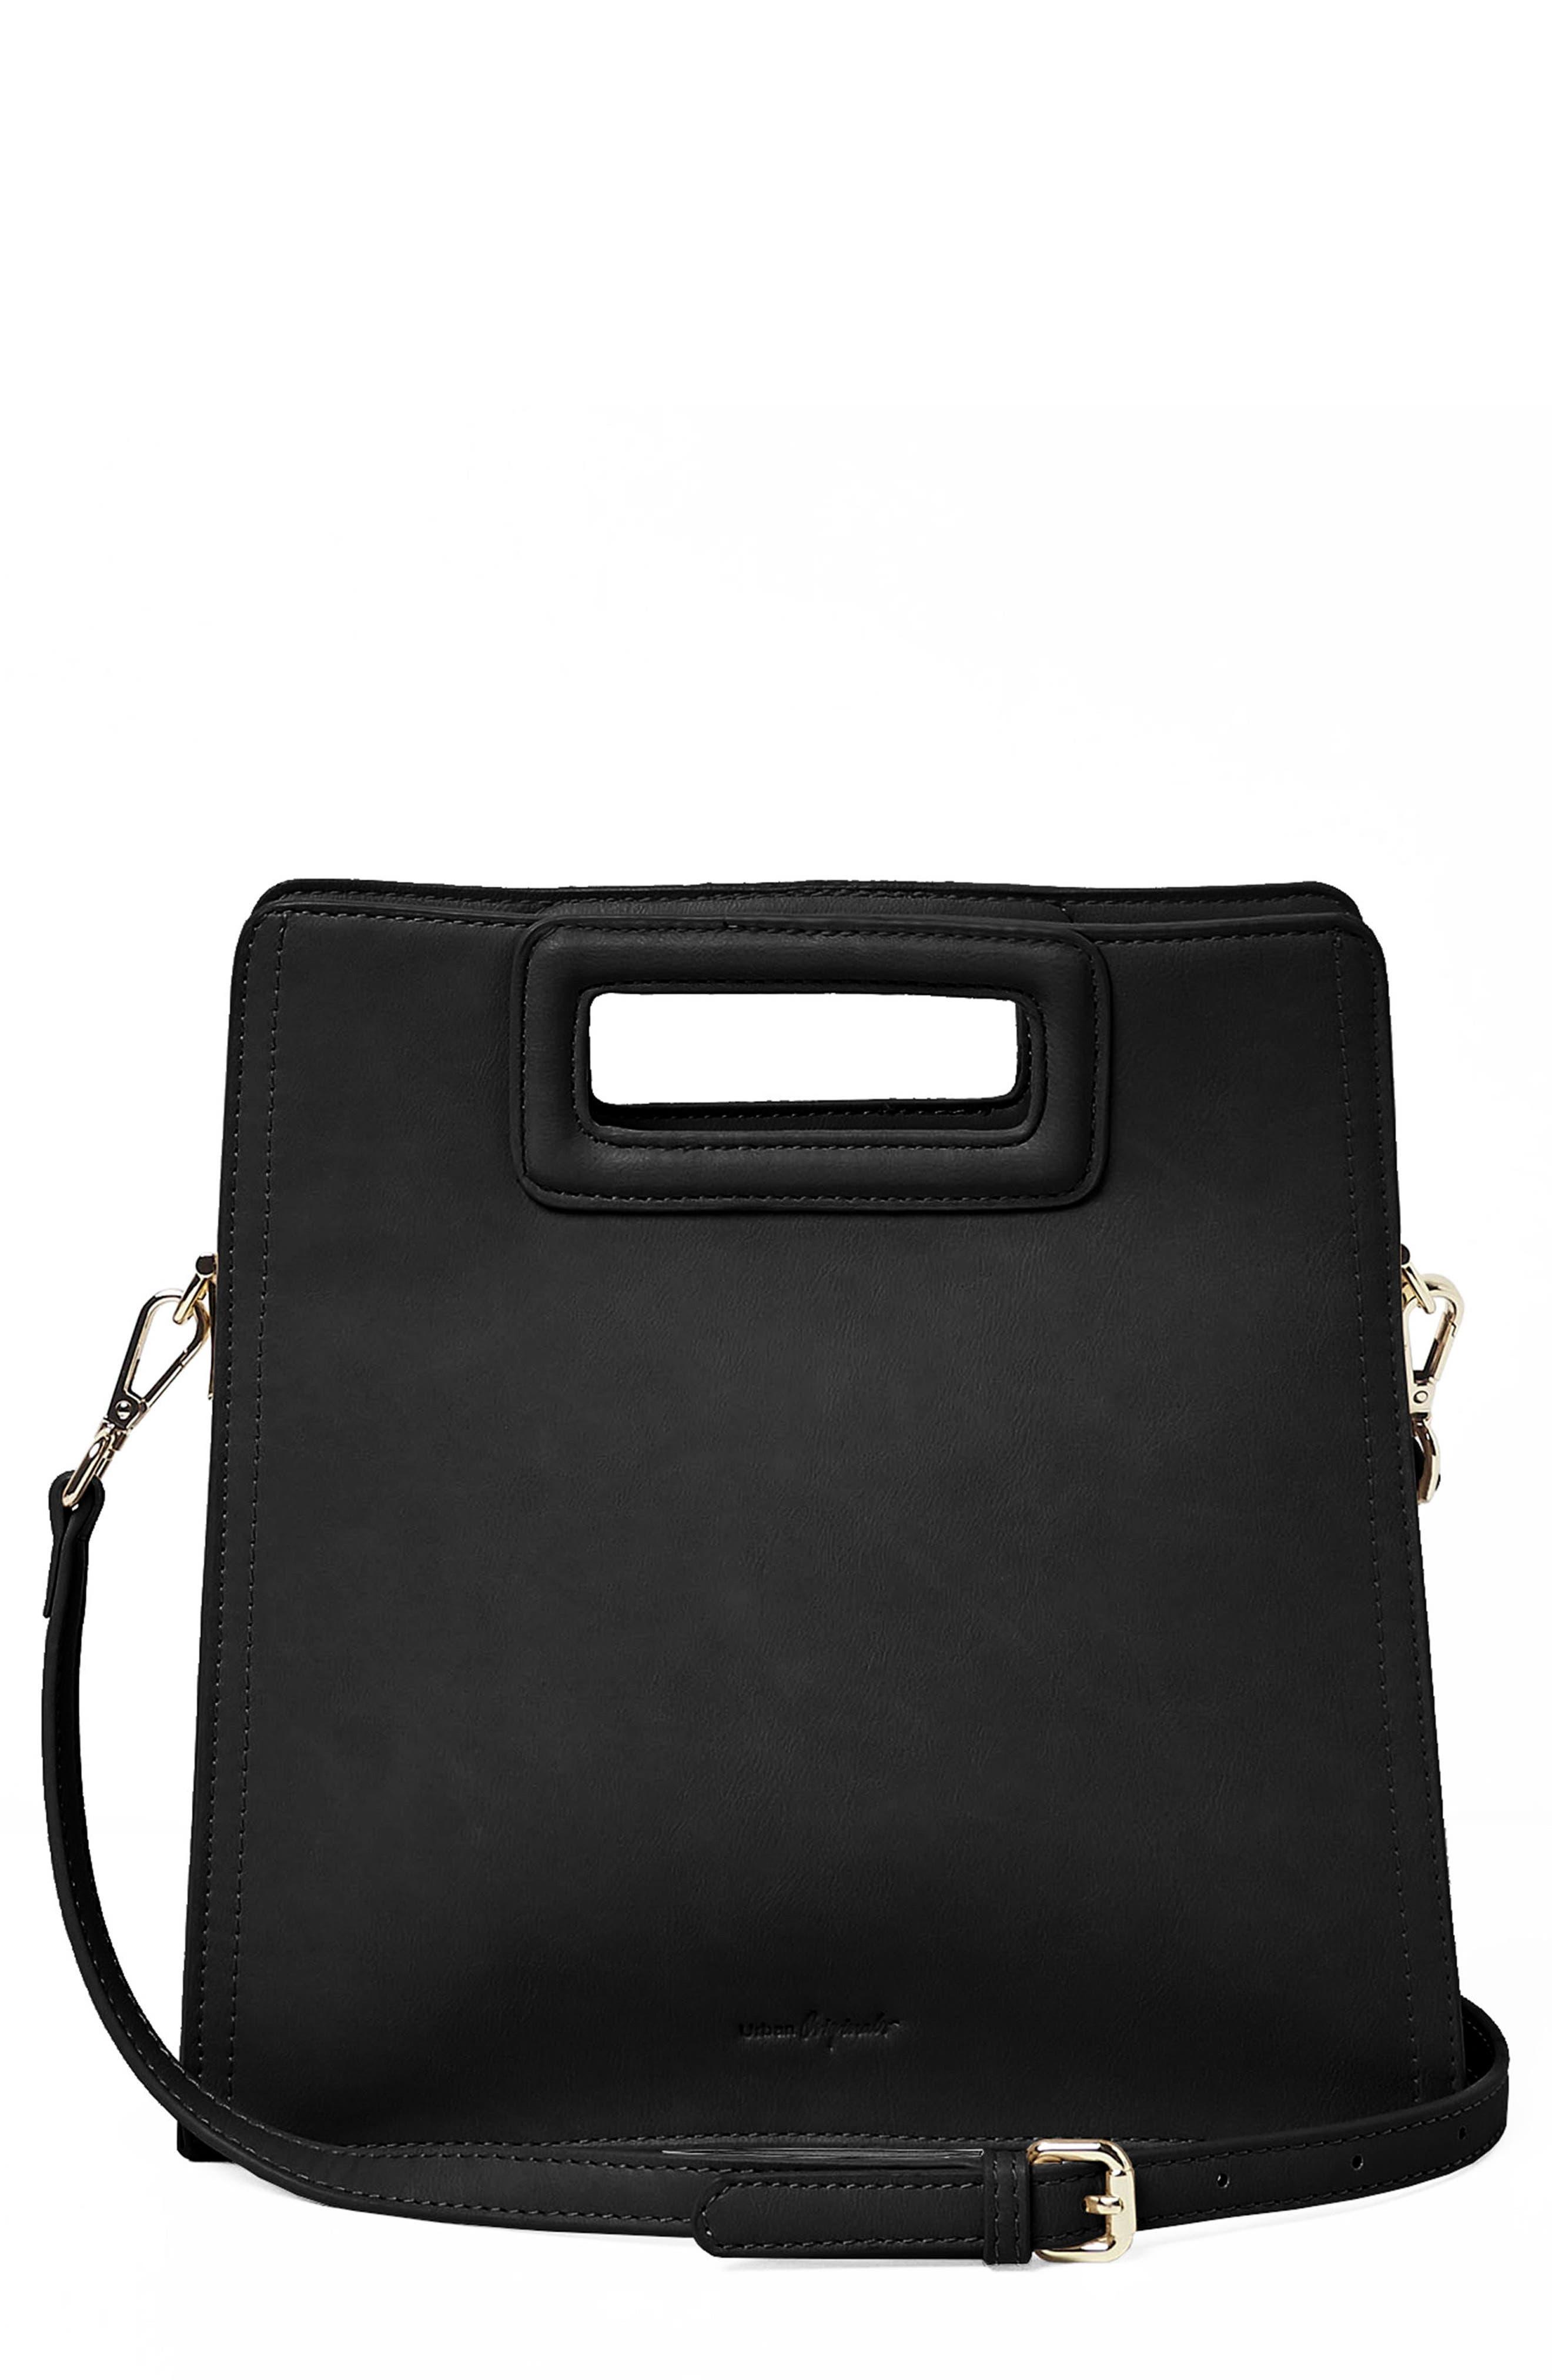 Perfect World Vegan Leather Crossbody Bag,                             Main thumbnail 1, color,                             Black